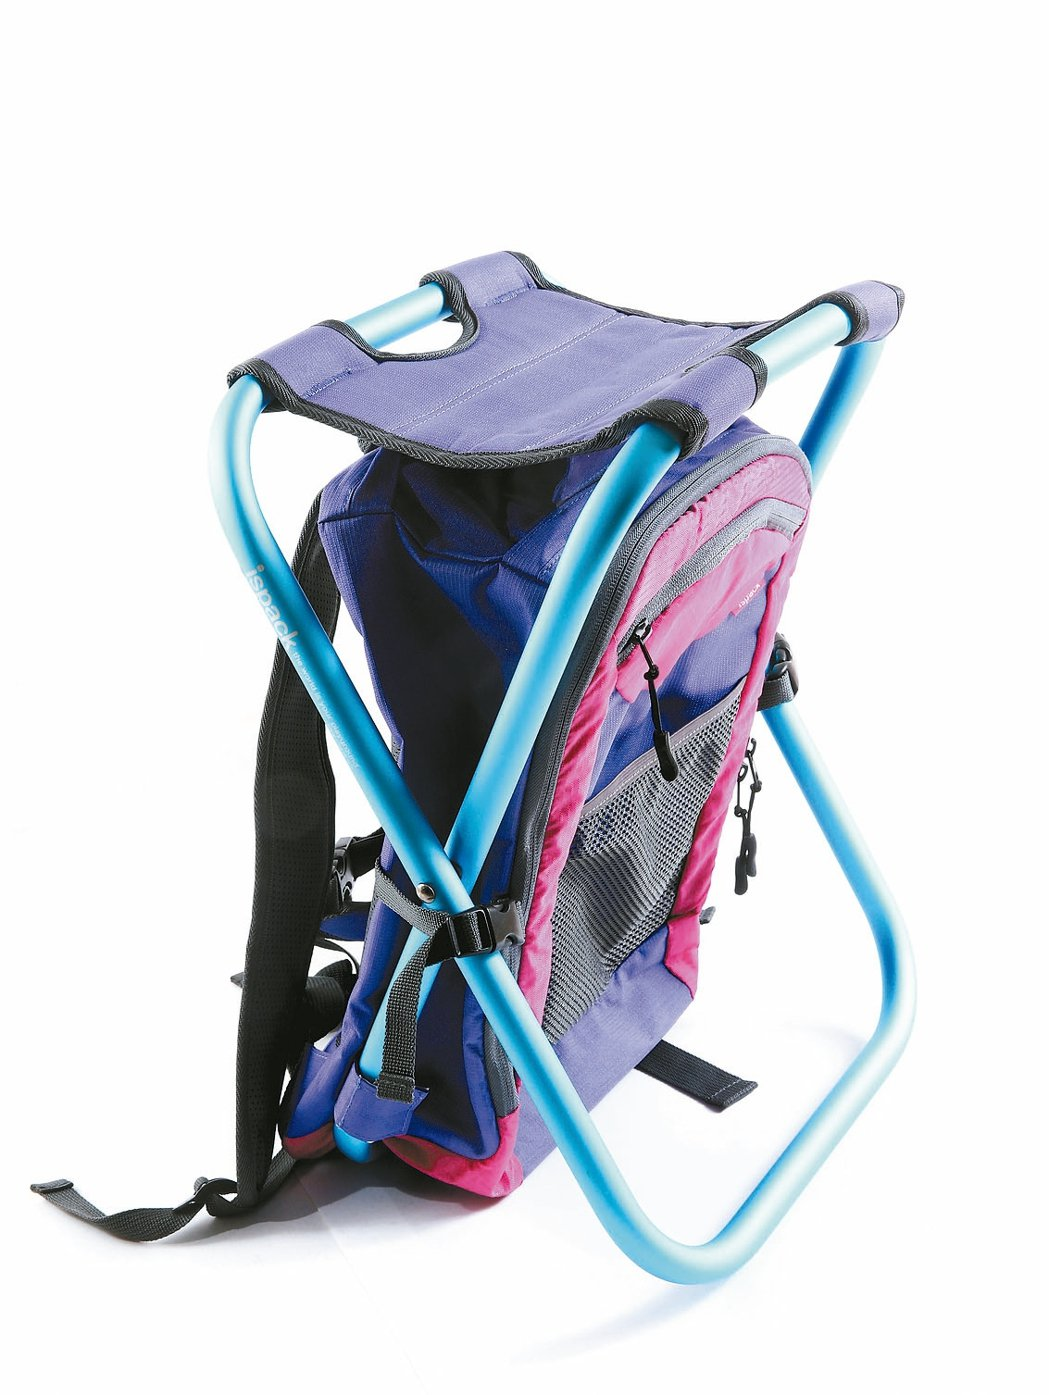 1380g輕量化背包椅。獨特的「隨背隨坐」設計,背到哪坐到哪,隨時可卸下成為一張...